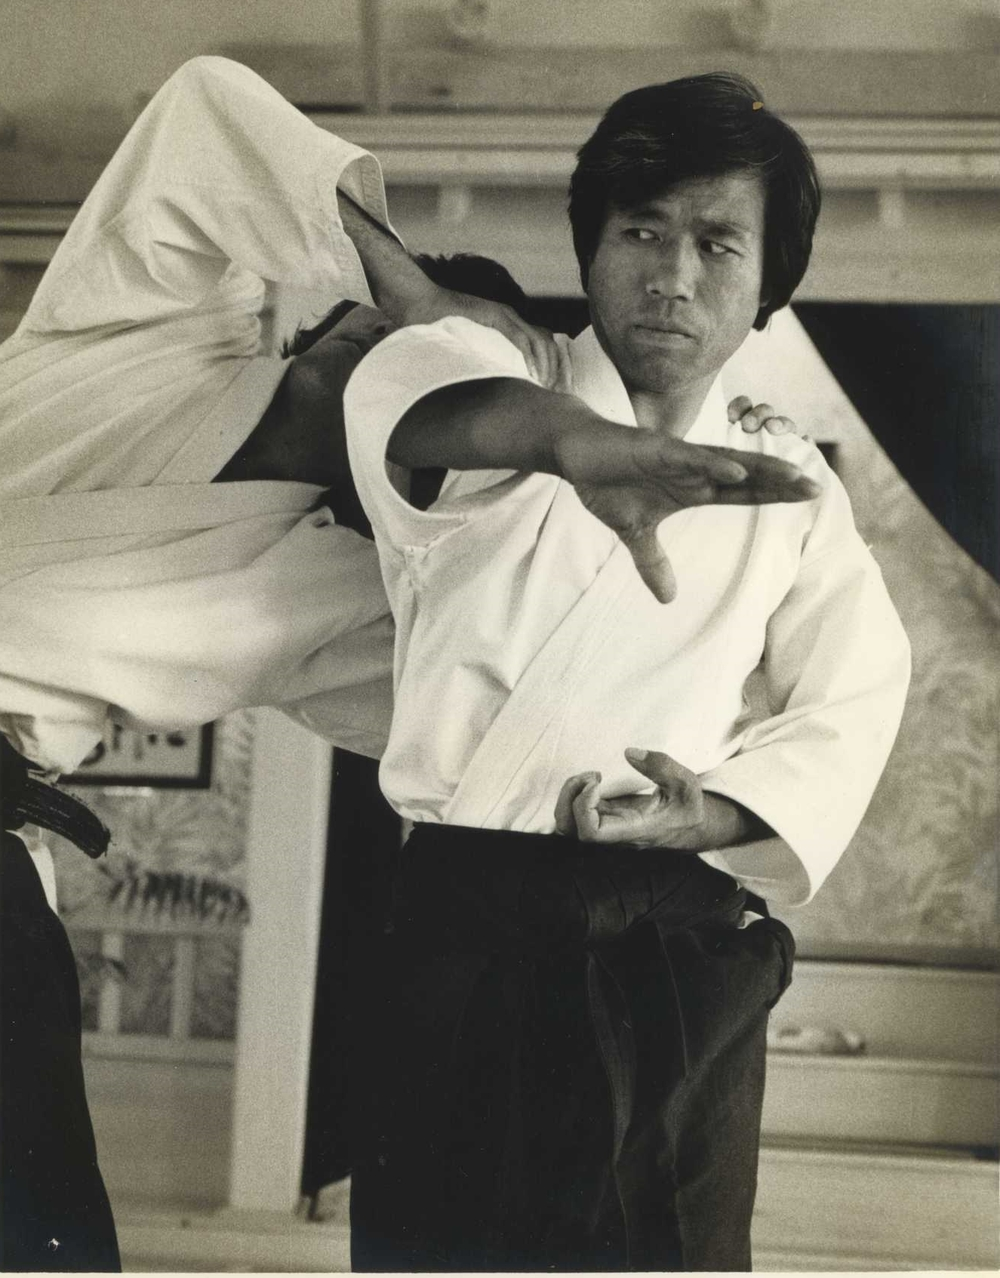 Saotome Shihan with Ikeda Shihan as uke in Sarasota, FL